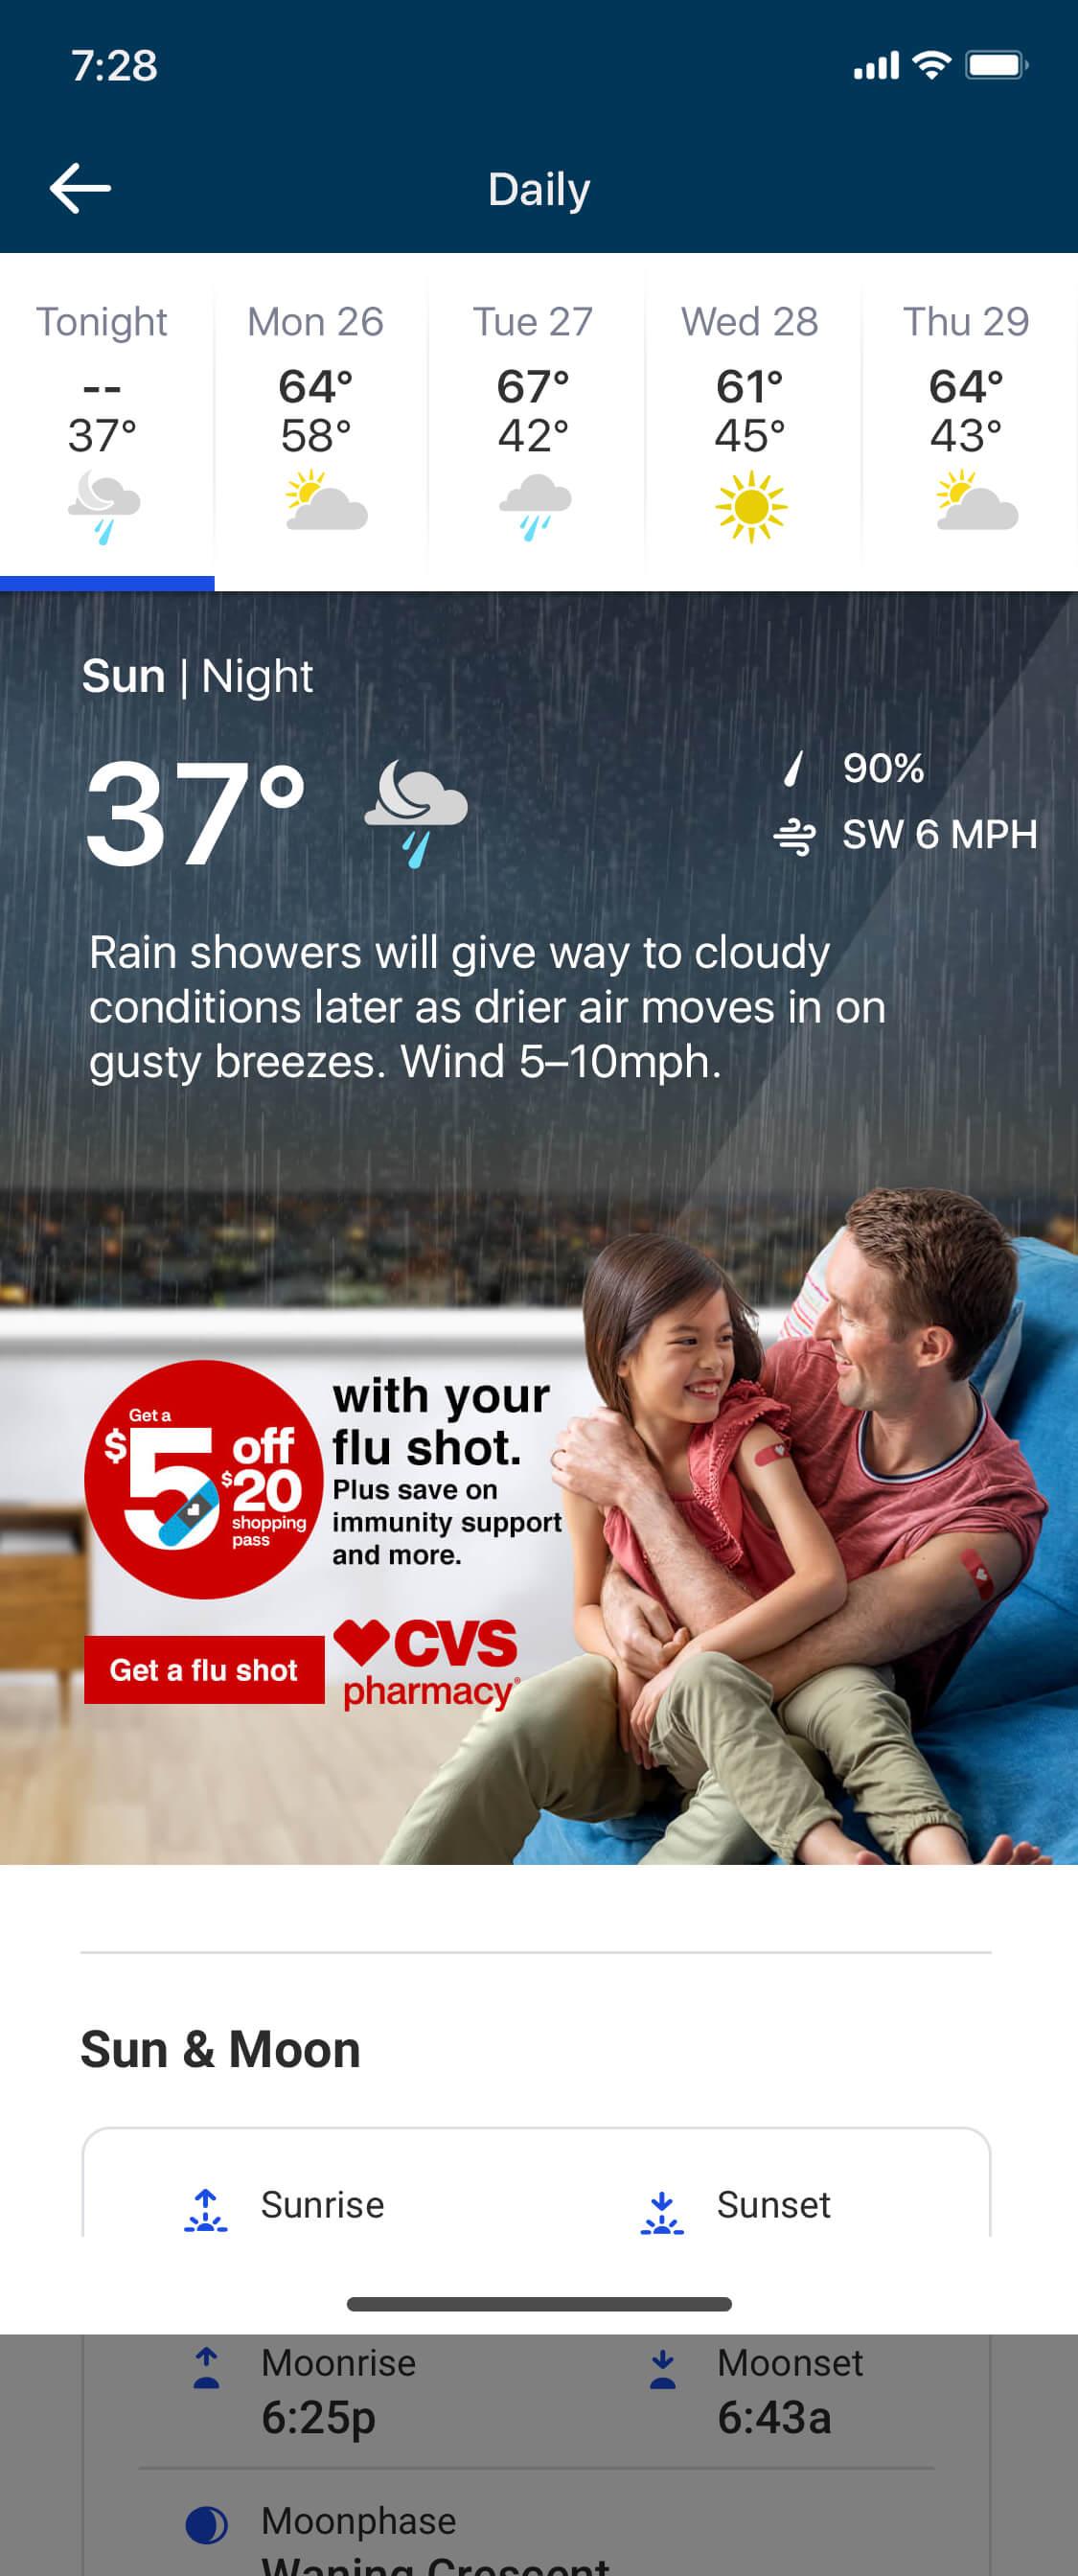 CVS - IDD-week_ahead-rain-n